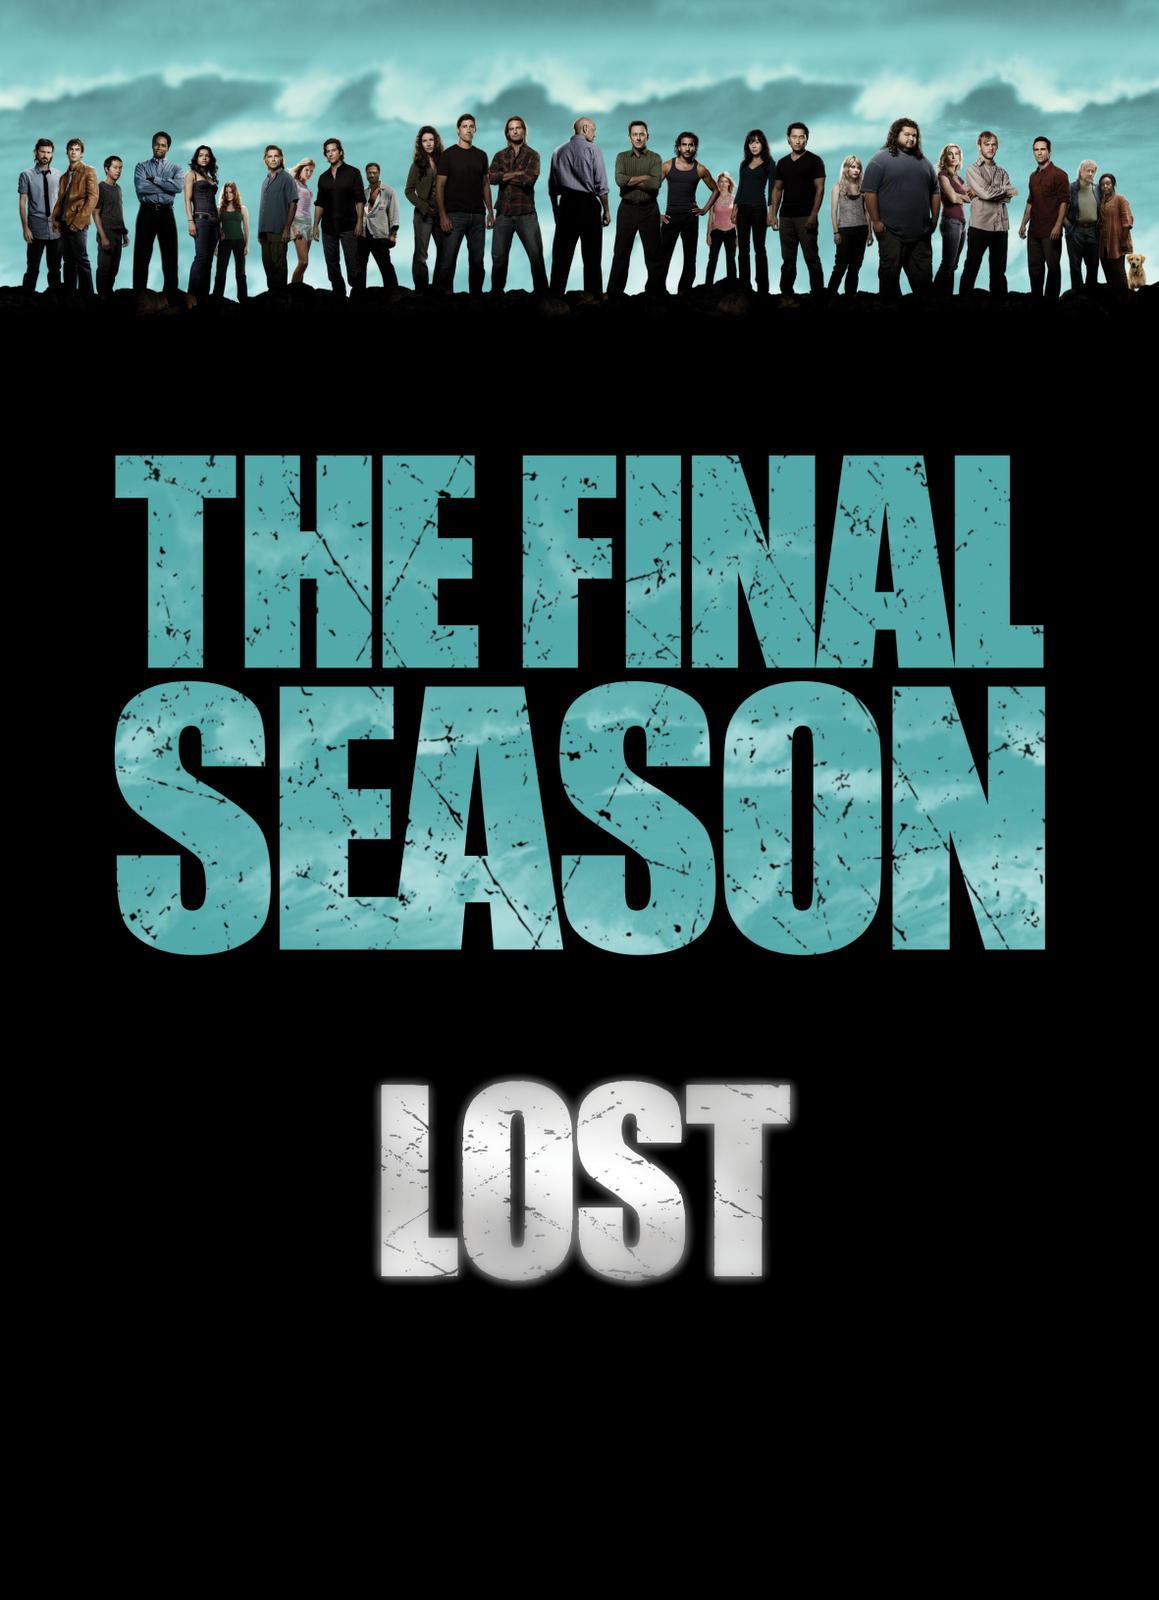 http://1.bp.blogspot.com/_cITye0YnYdM/SwT9oT79XDI/AAAAAAAAJ4U/HDzmaAm1Da0/s1600/Lost+Season+6+Poster.png